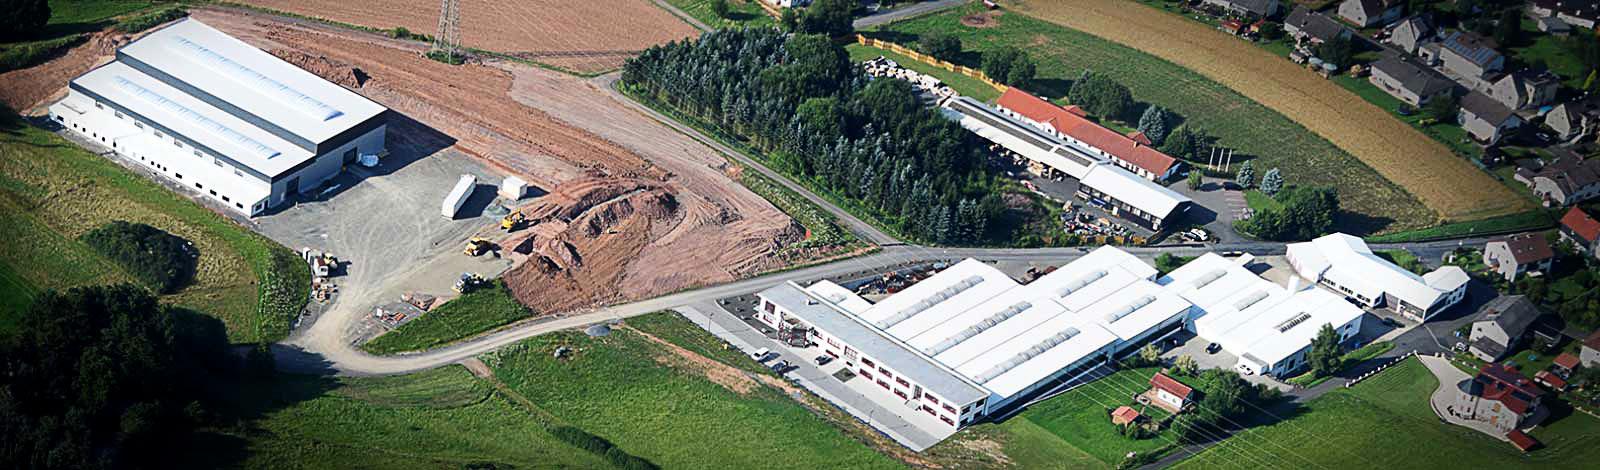 Luftbild Firma MJM